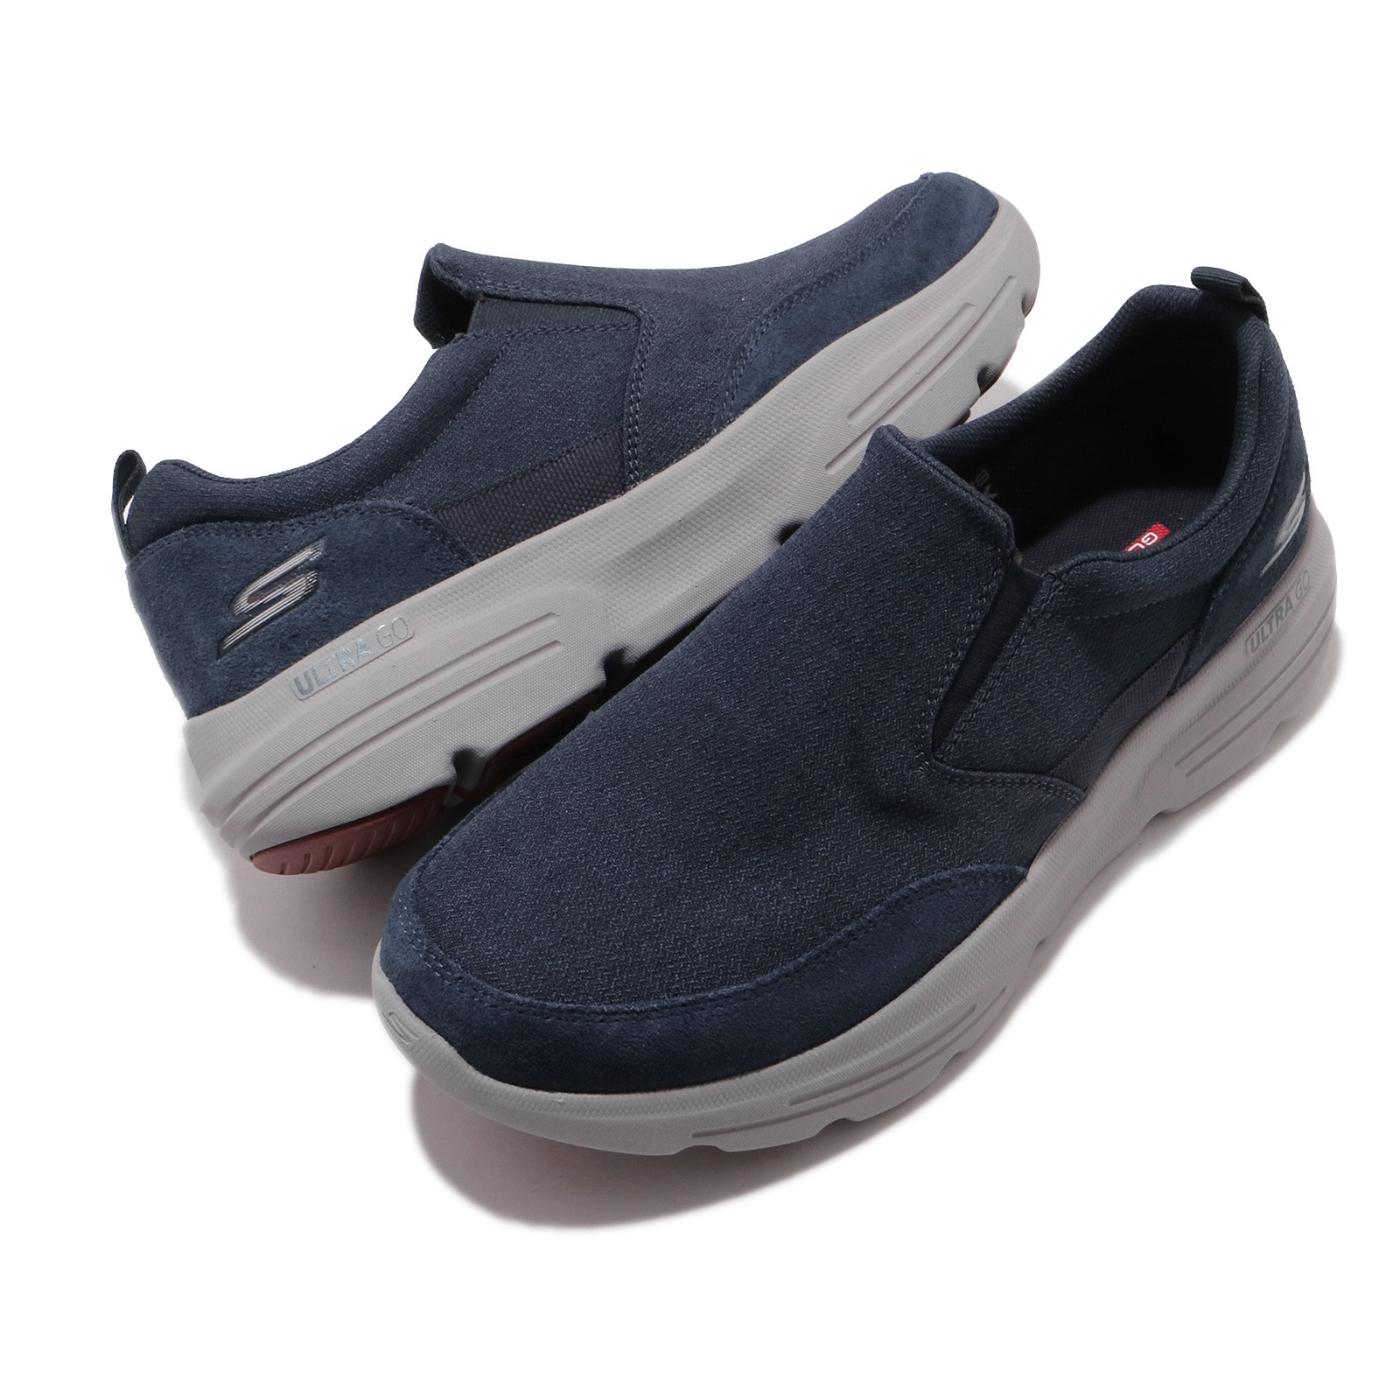 Skechers 休閒鞋 Go Walk Duro 套入式 男鞋 踏青 健走 外出 輕便 好穿脫 懶人鞋 藍 灰 216008NVGY